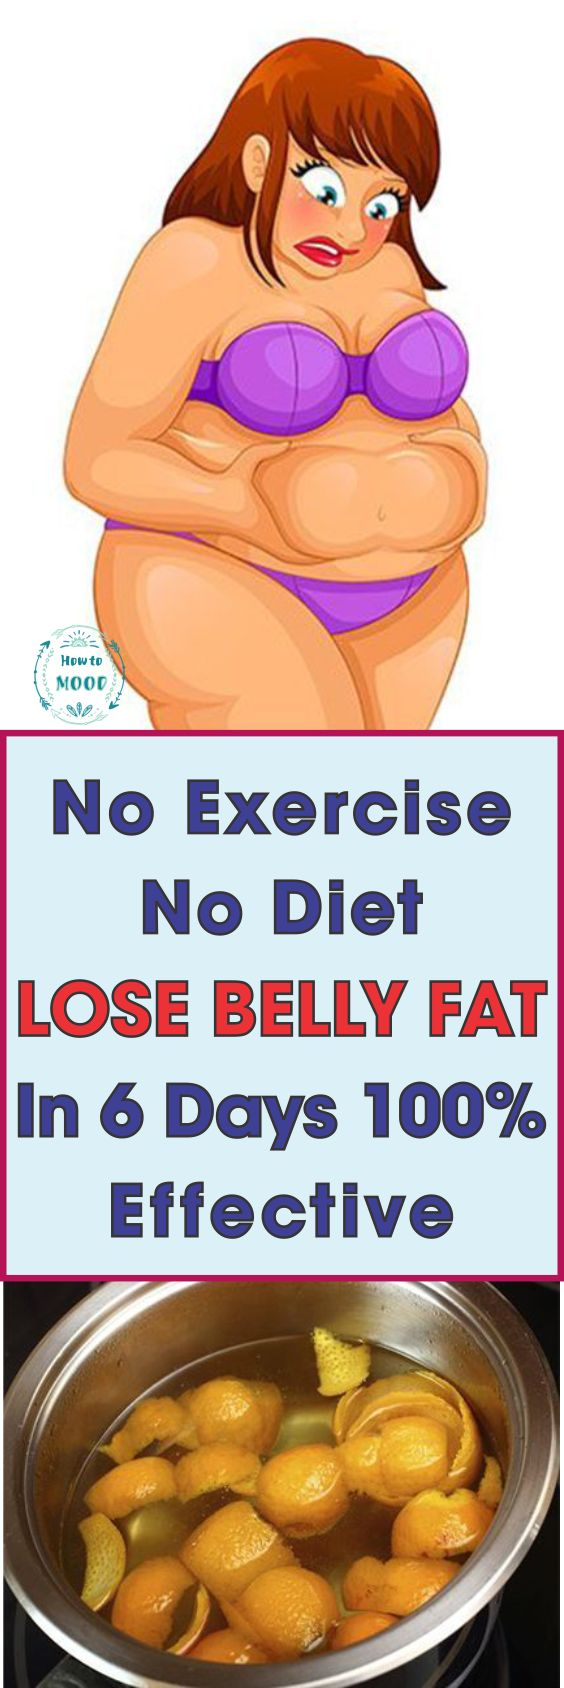 Lemon Peel Weight Loss Drink – That Works Best #weightloss #lemon #weightlossrecipes #drinkrecipes